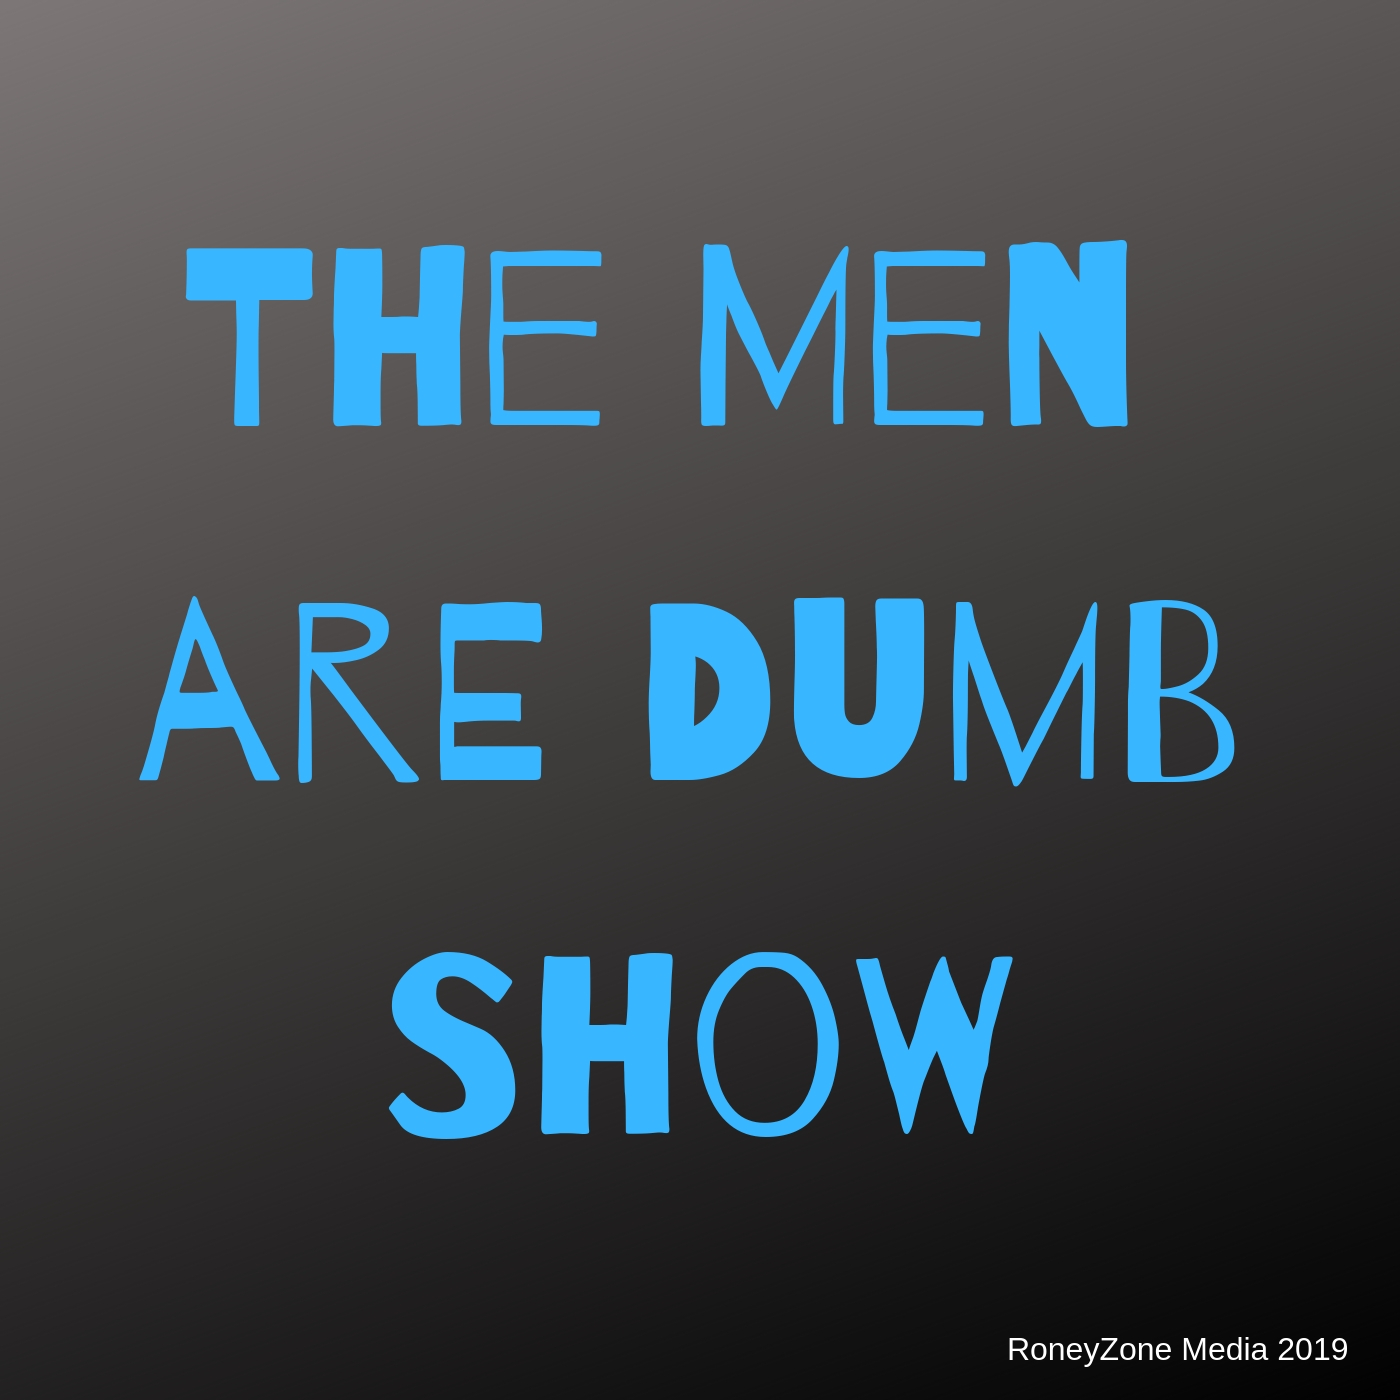 The Men are Dumb Show